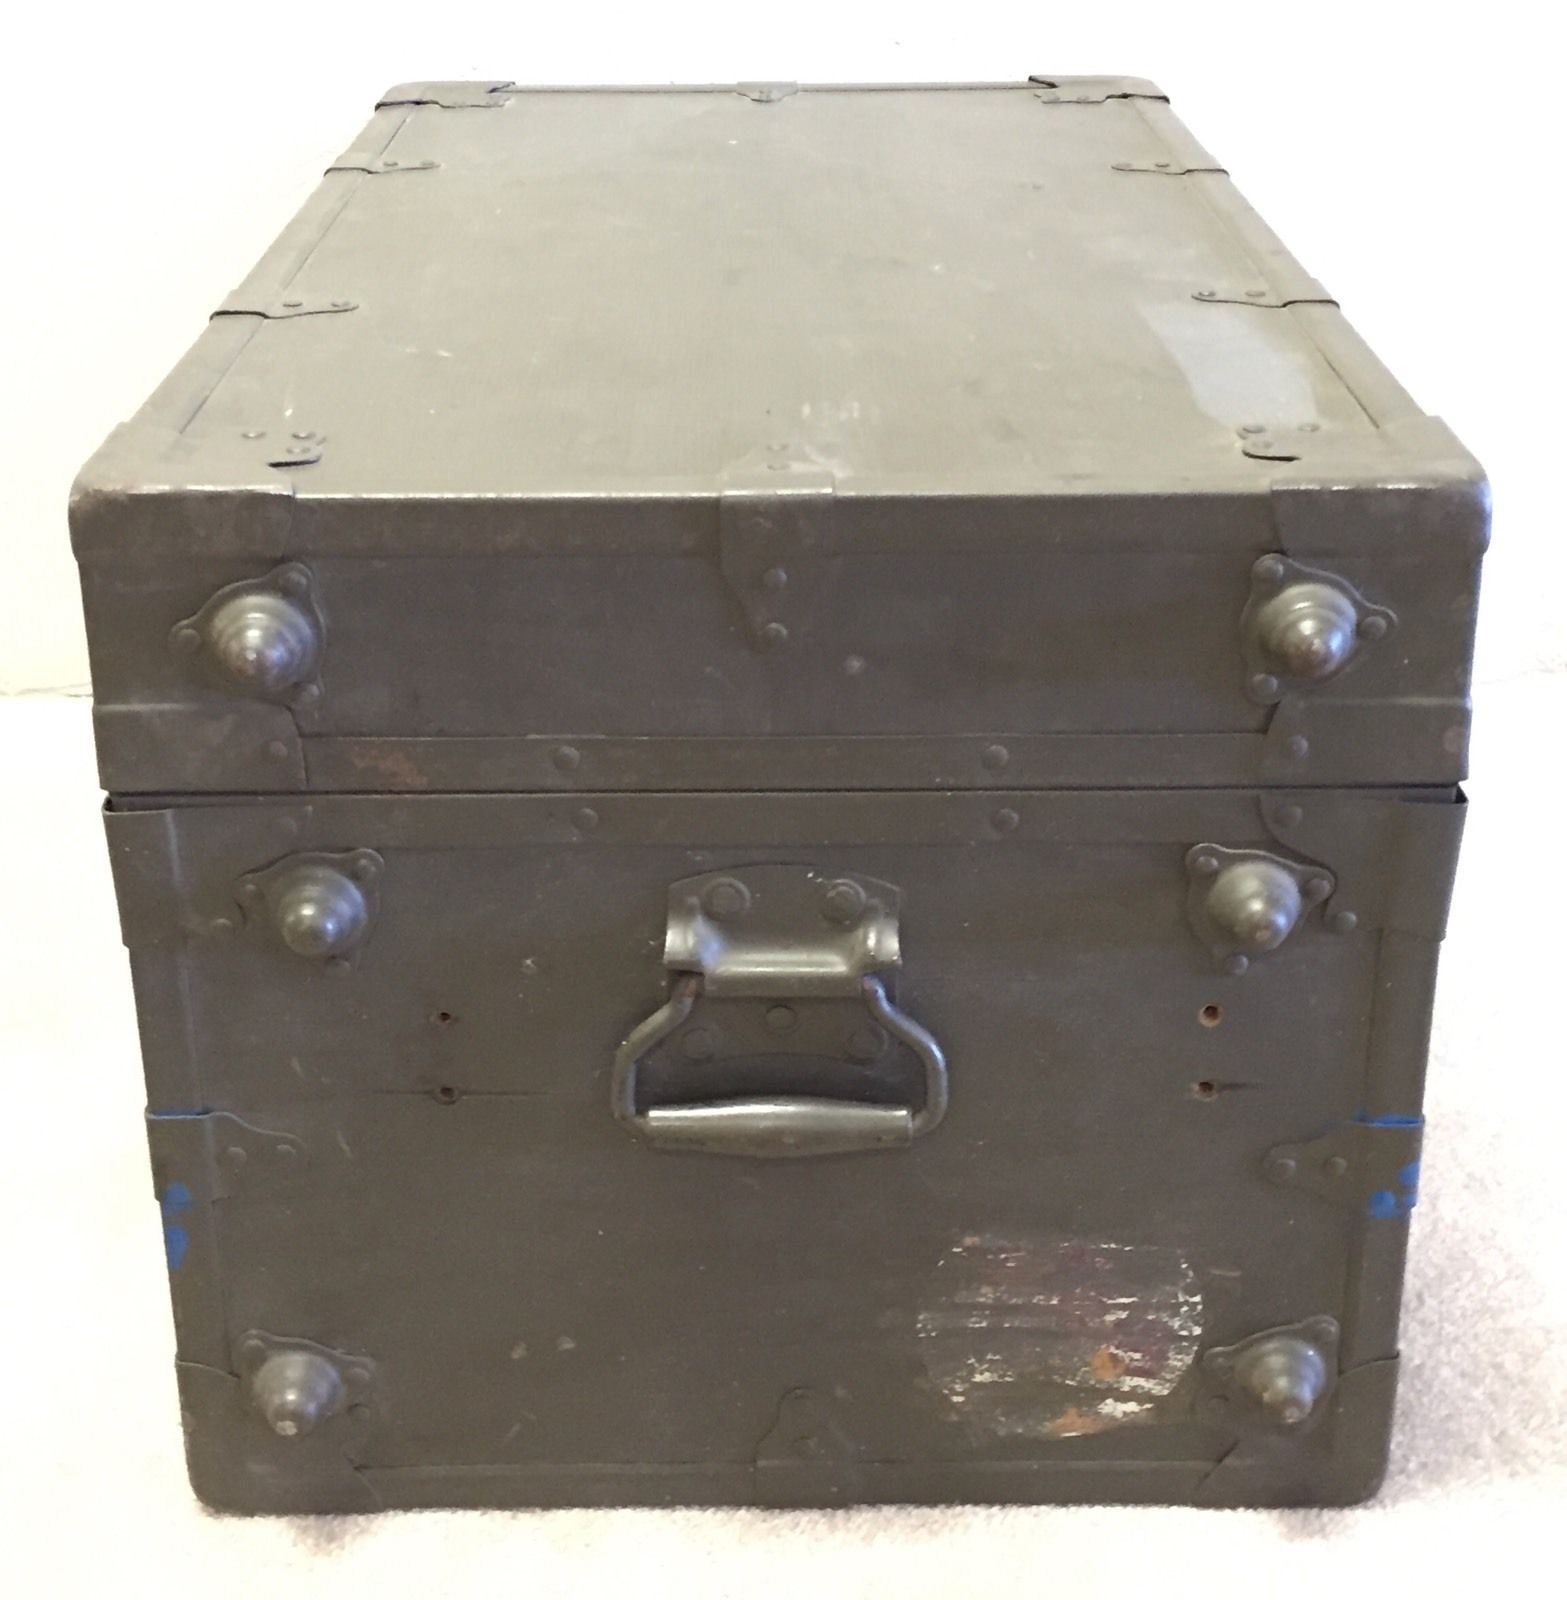 Vintage US Military Army Brown X Ray Equipment Foot Locker Trunk Storage  Box | EBay | WWII Small Army Medical Trunks | Pinterest | Foot Locker, ...